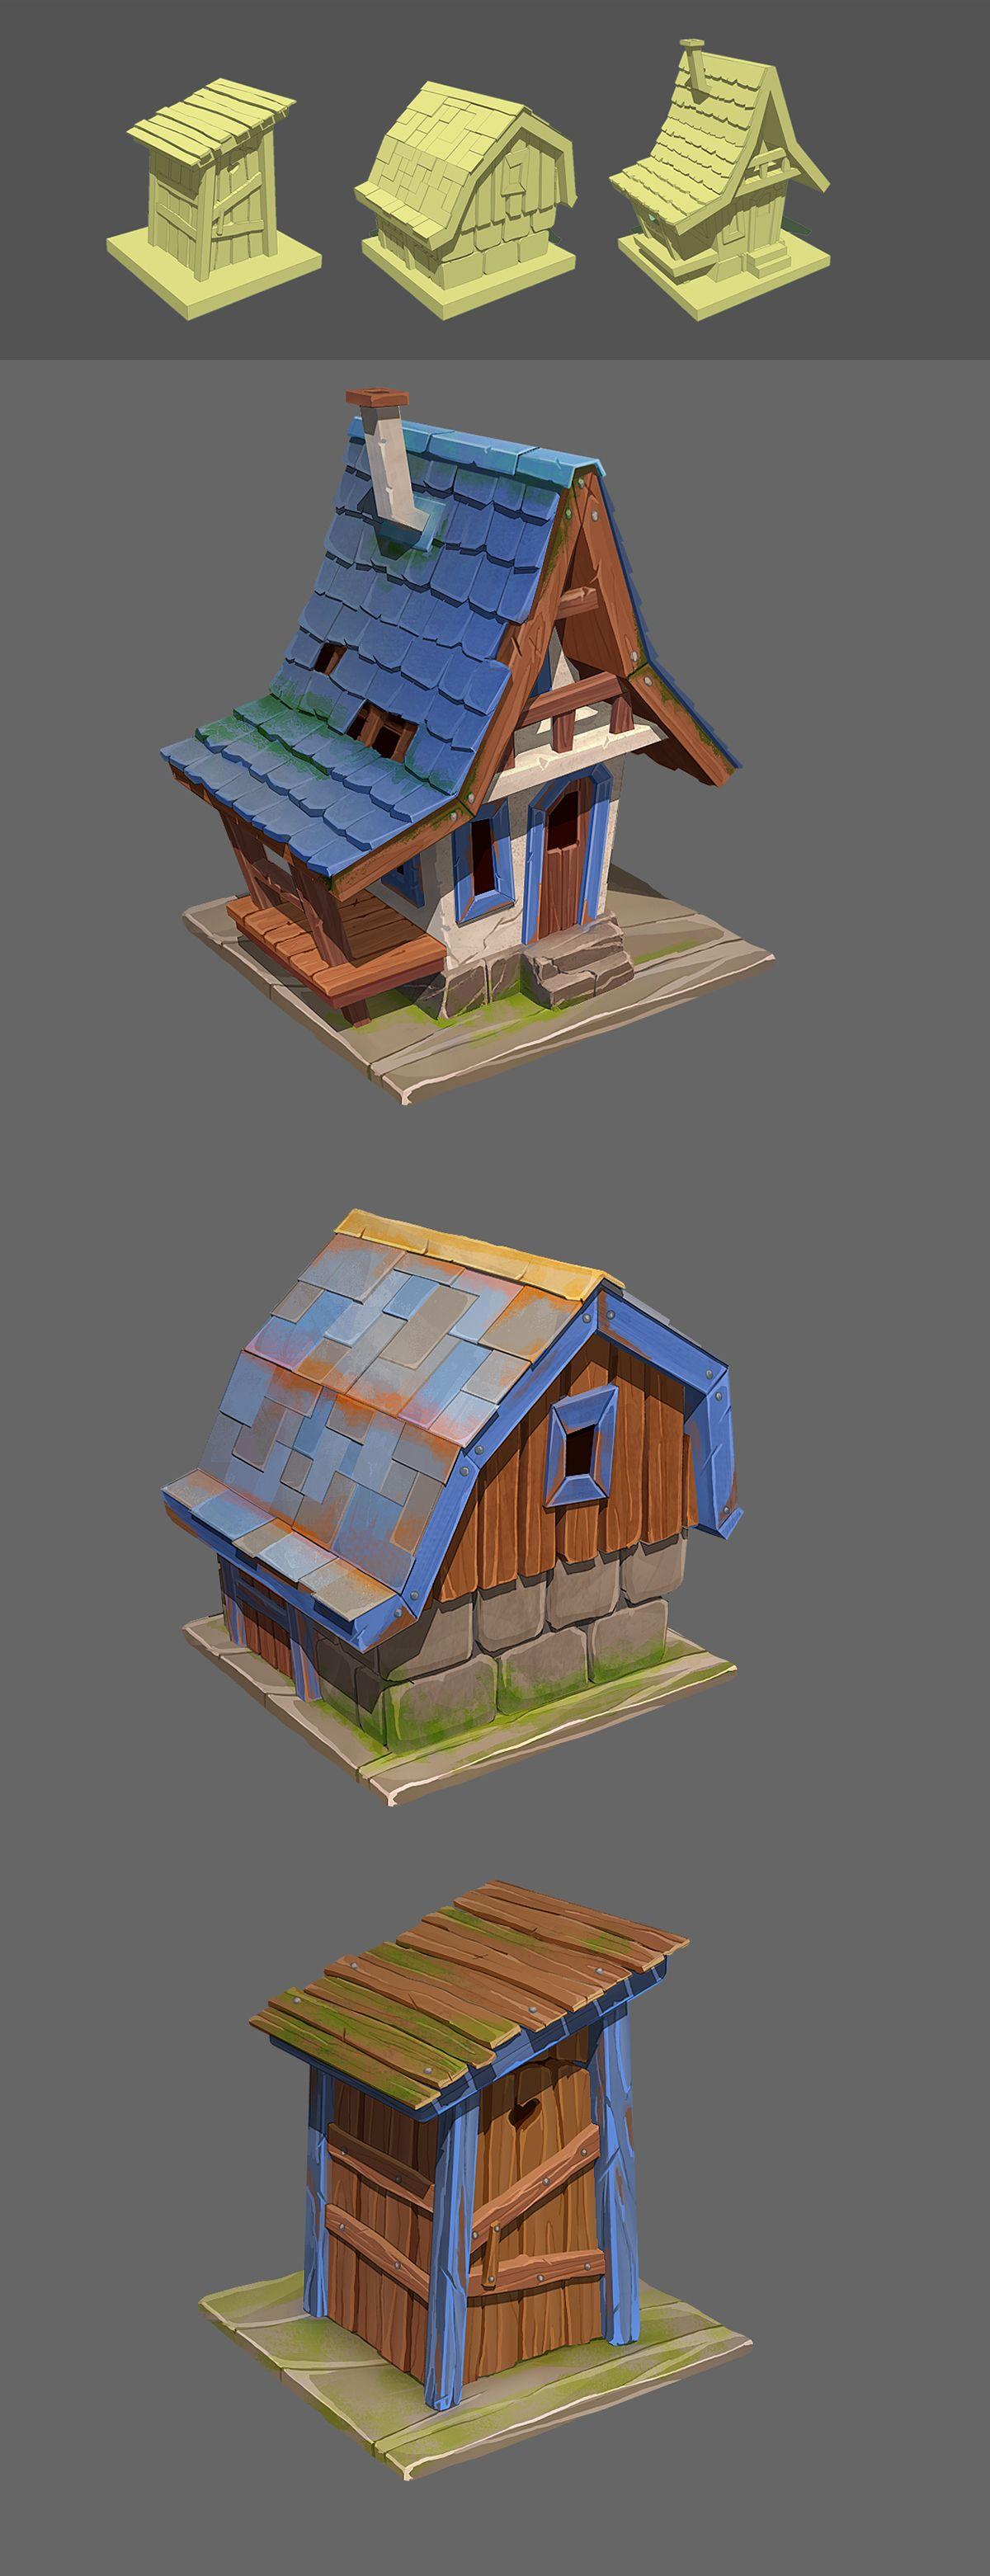 Game itesm. House, barn, toilet